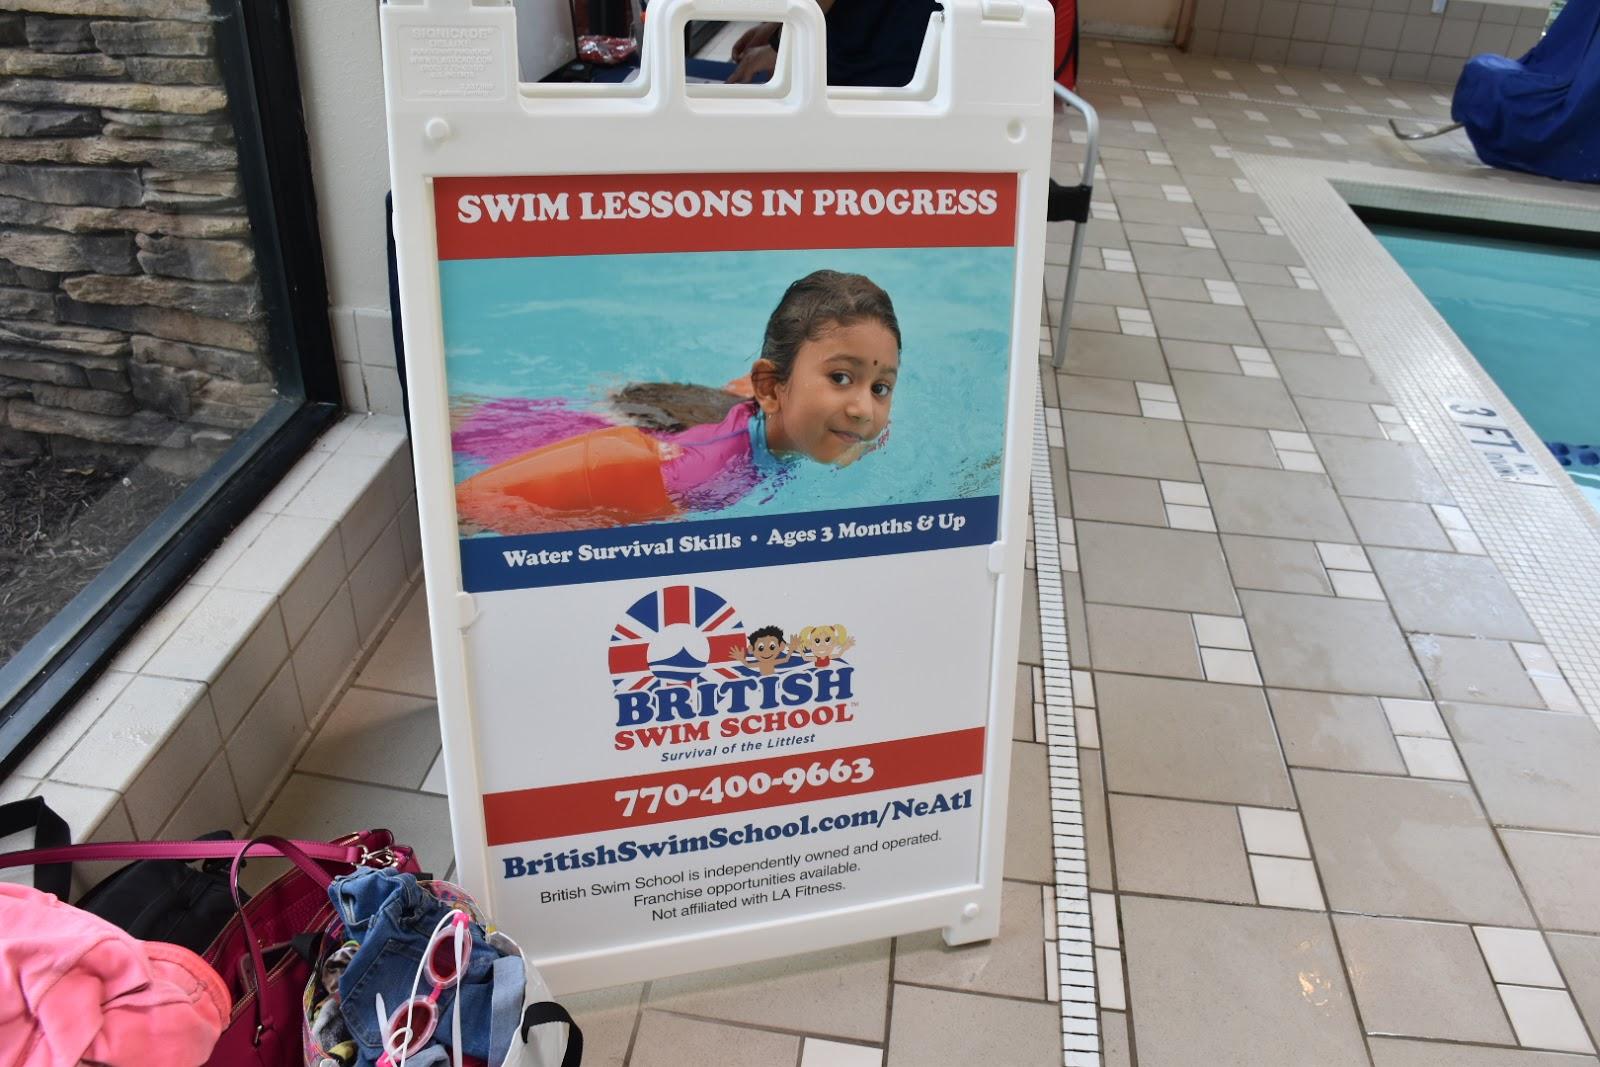 Swimming and Survival Training at British Swim School  via  www.productreviewmom.com